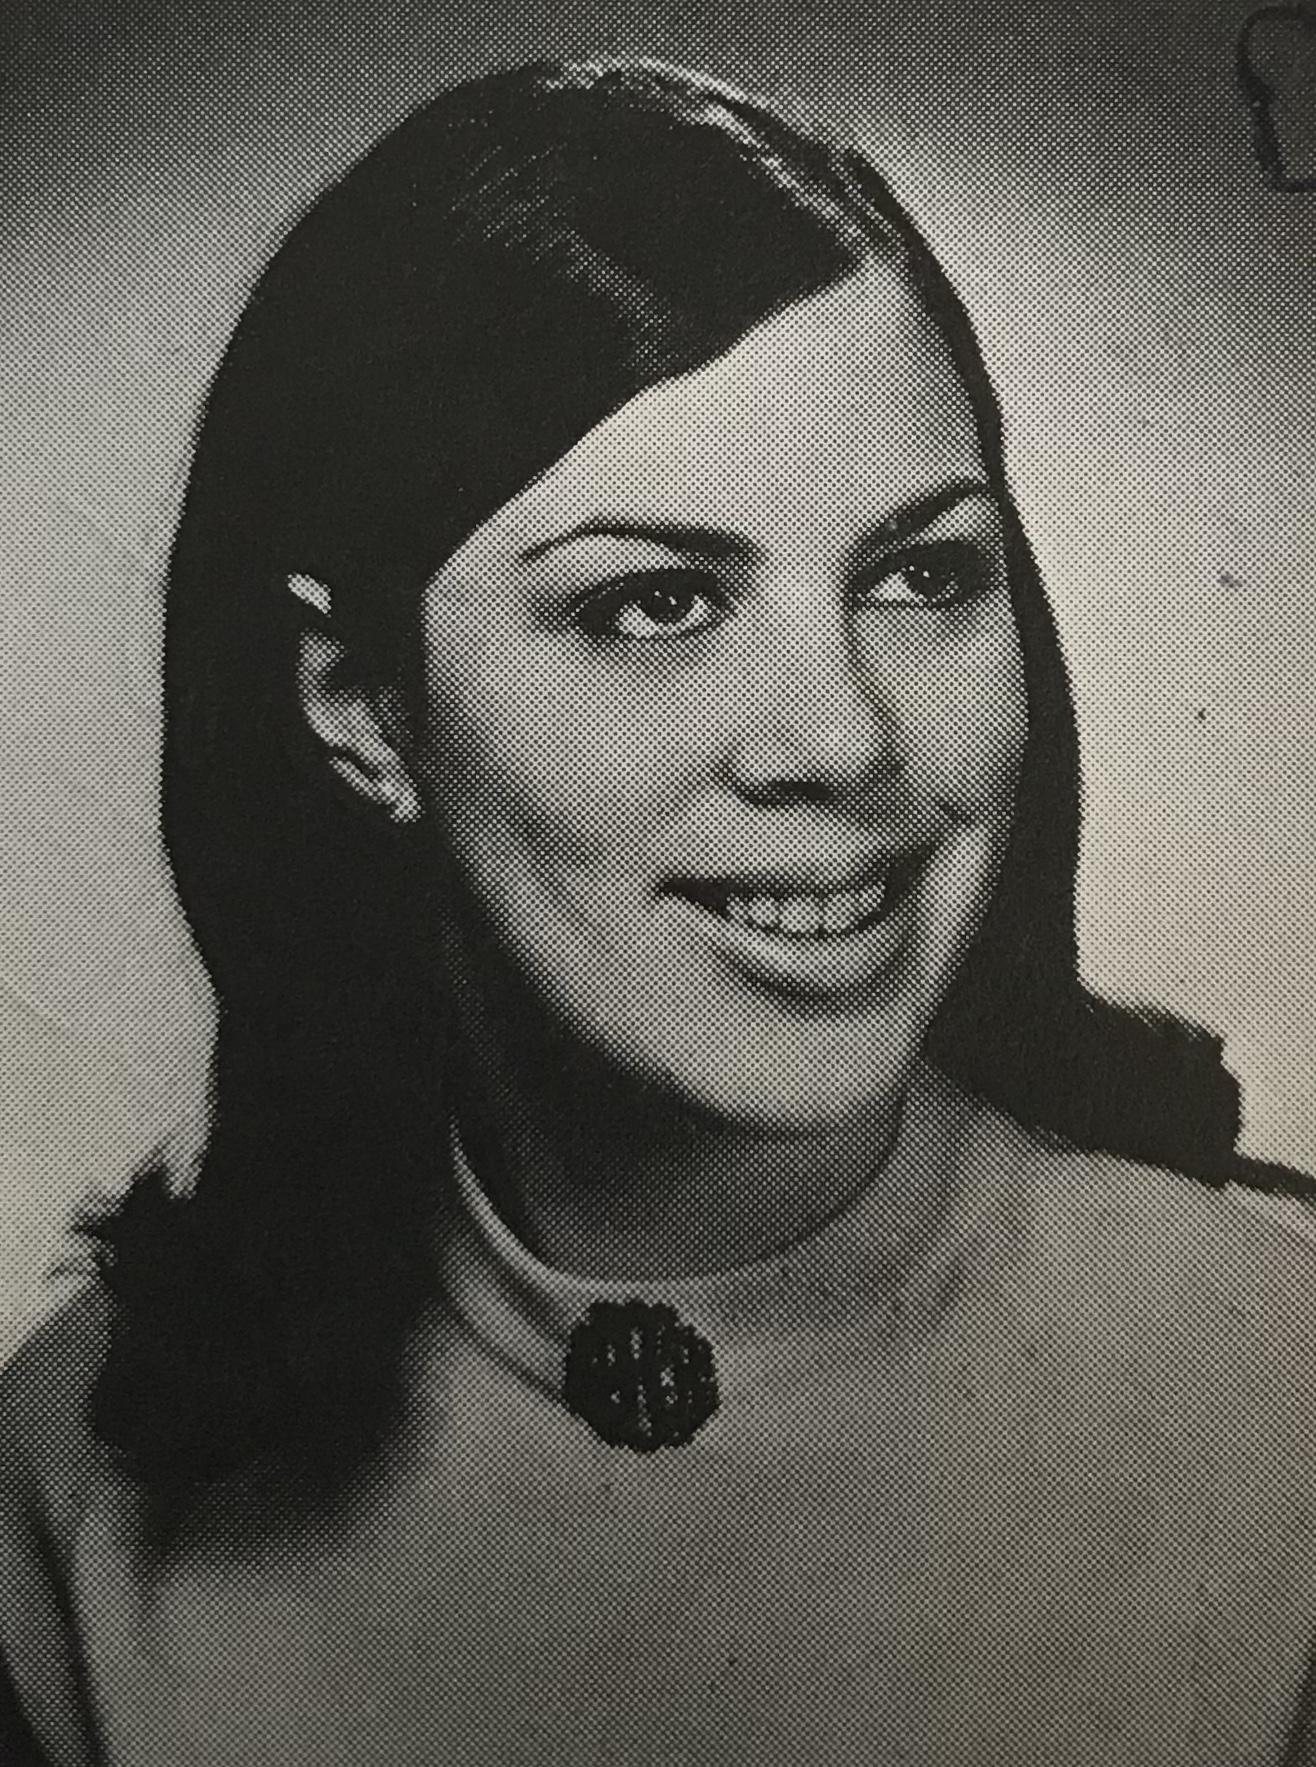 Margie Hertz Madison